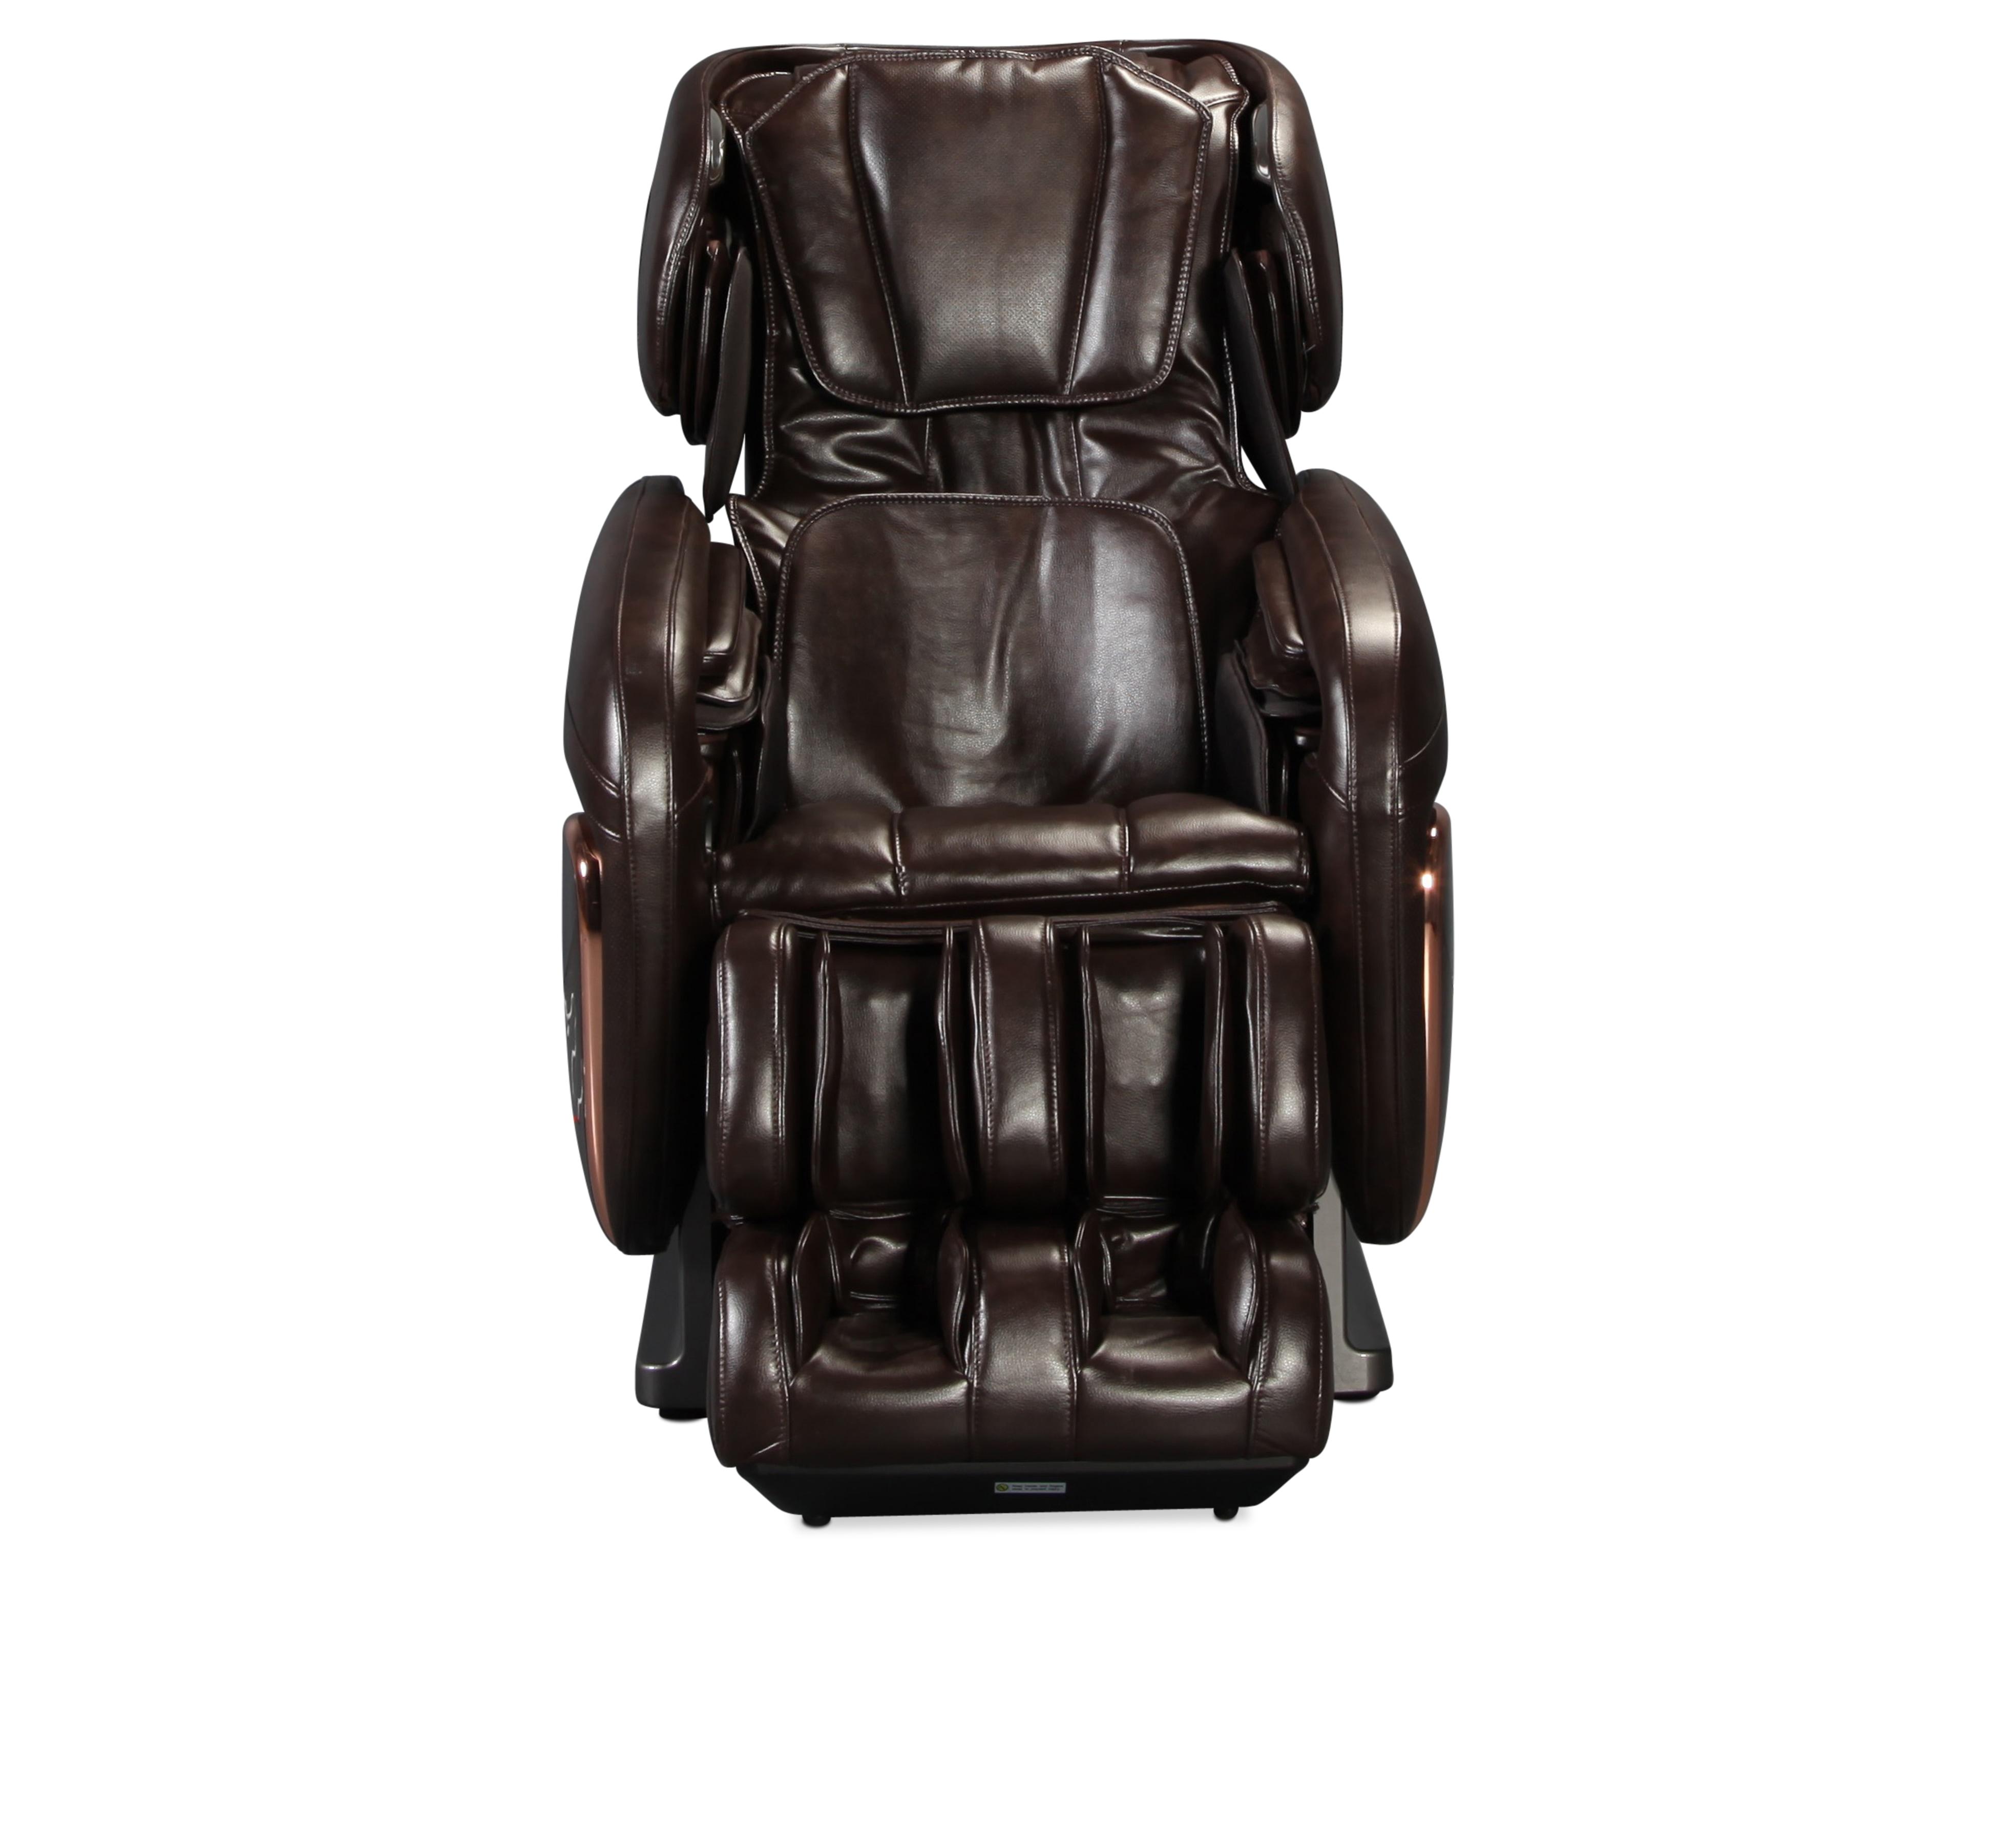 Ziron Robotic Massage Chair